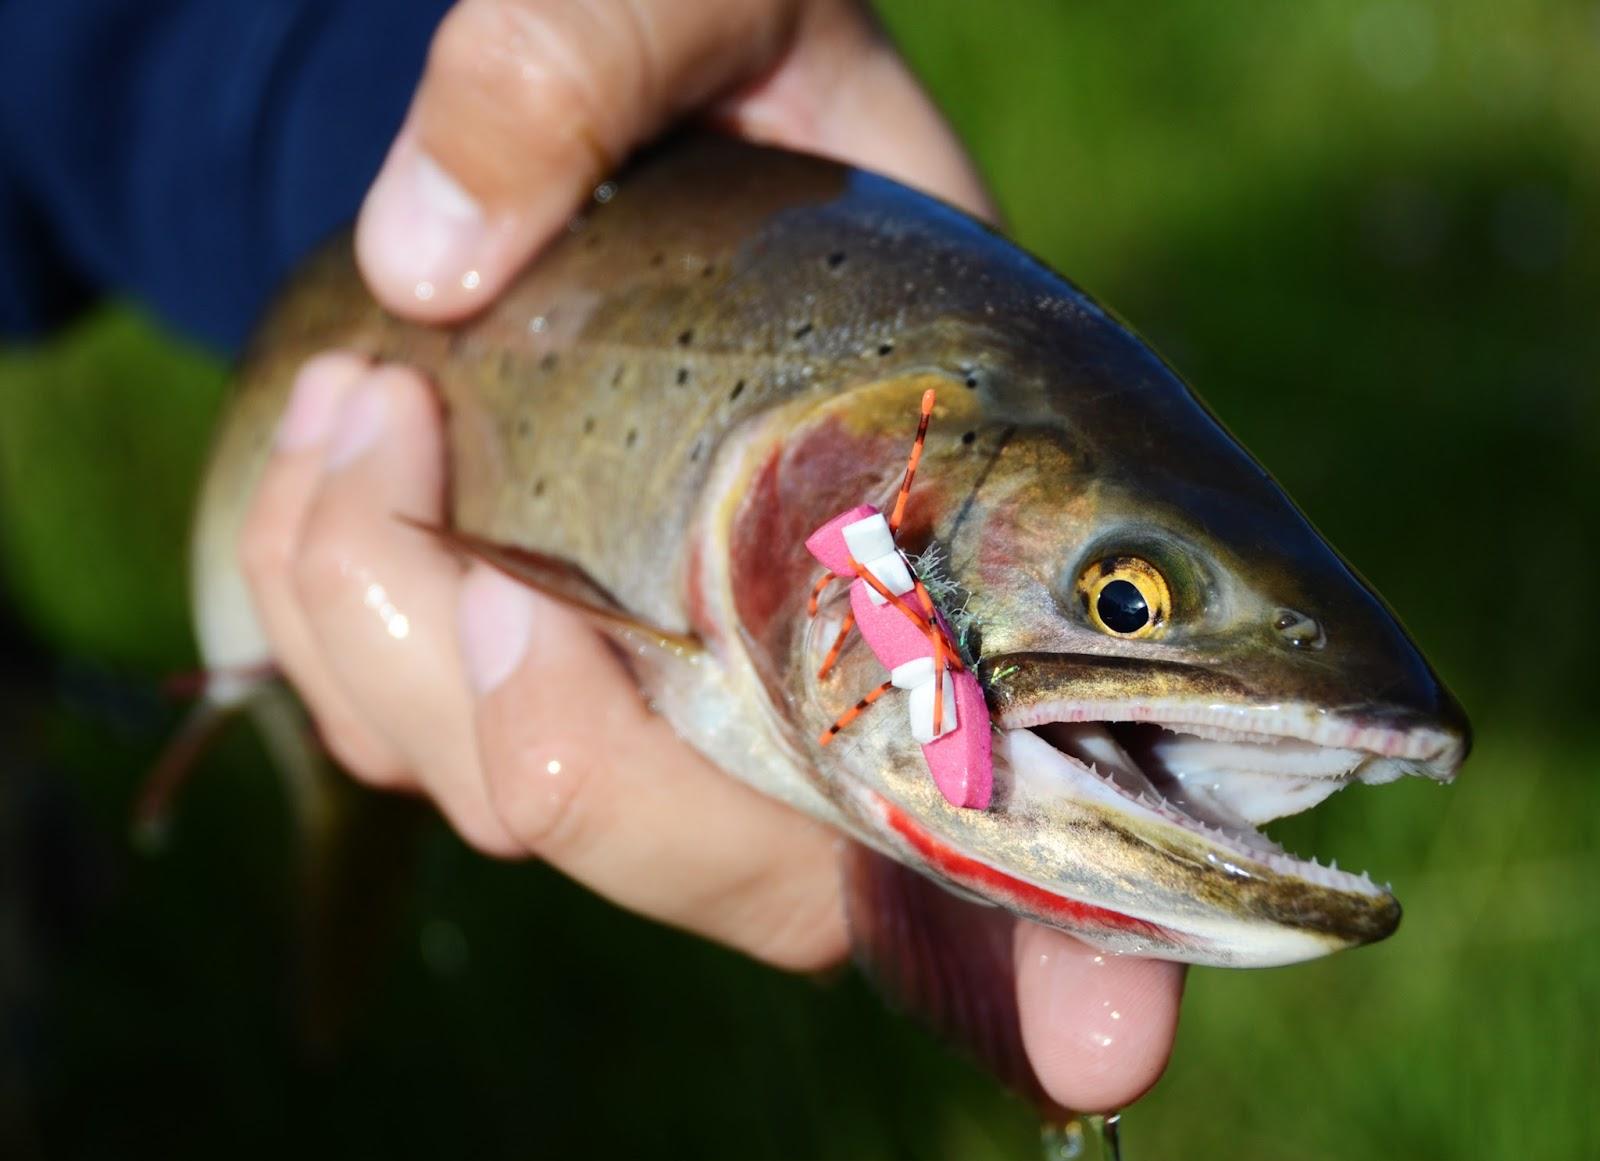 Mutated Fish In Chernobyl | www.imgkid.com - The Image Kid ...